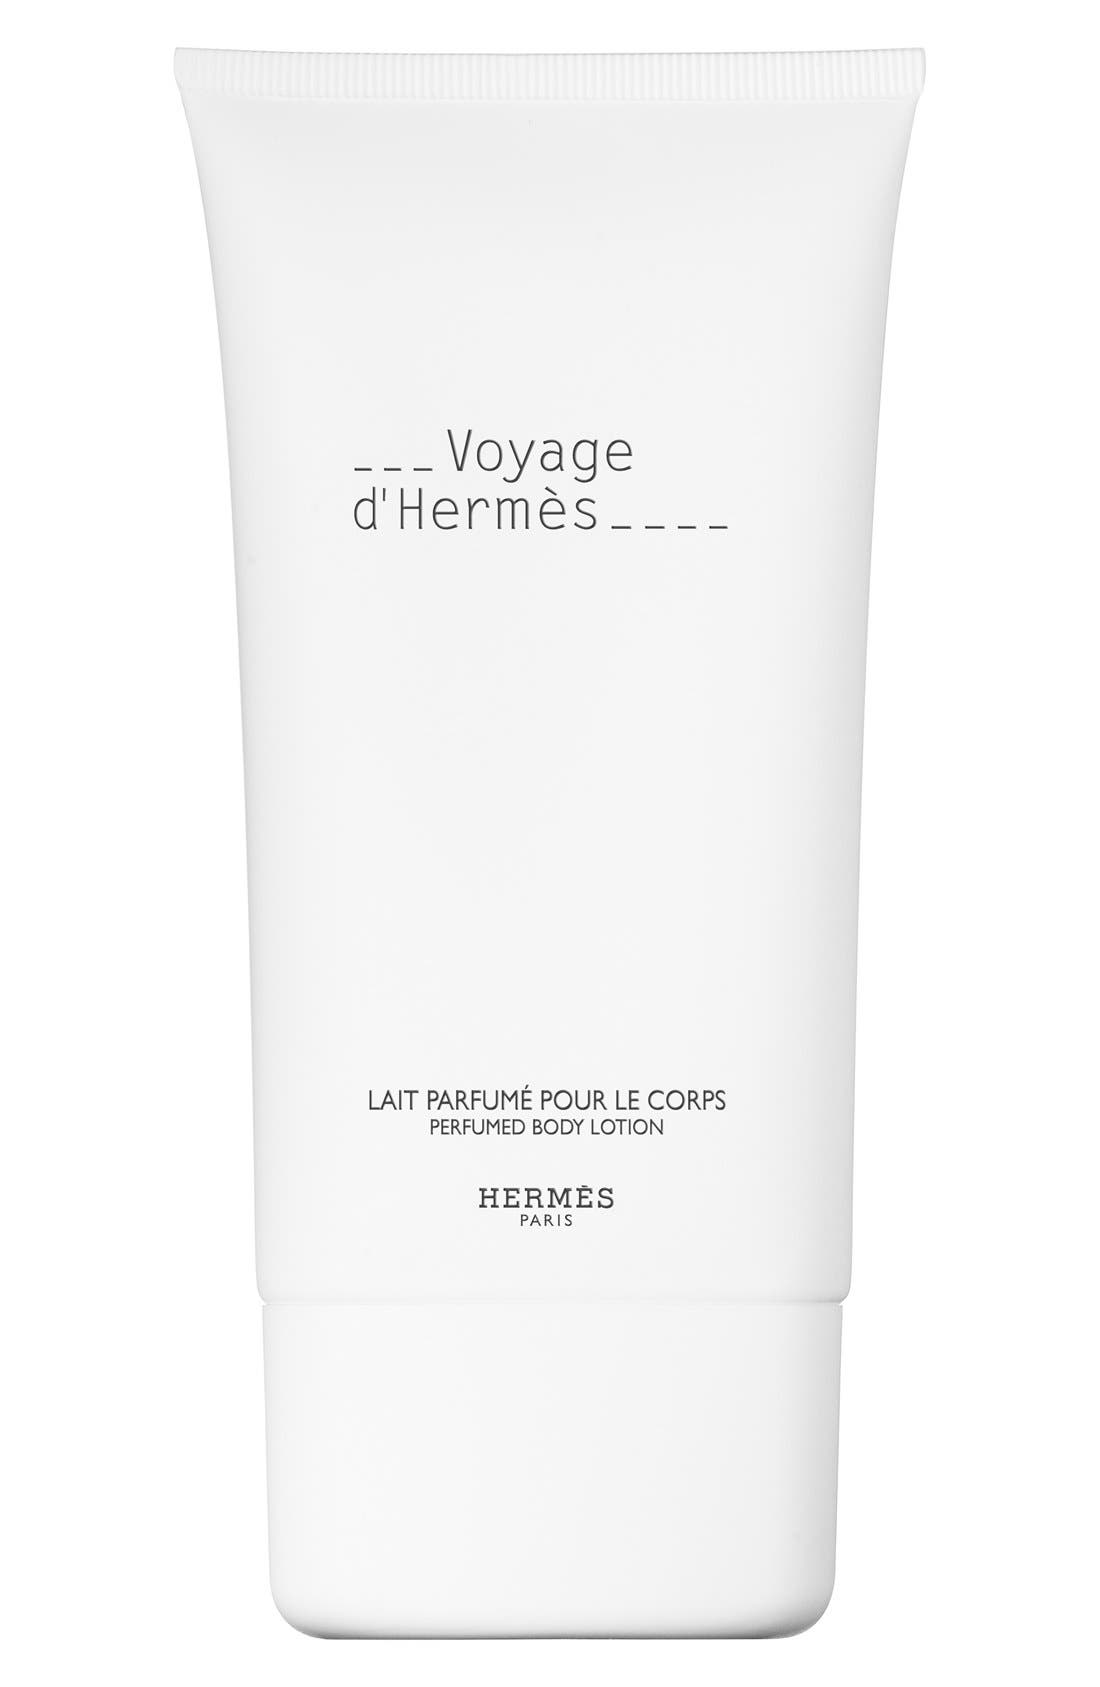 Hermès Voyage d'Hermès - Perfumed body lotion